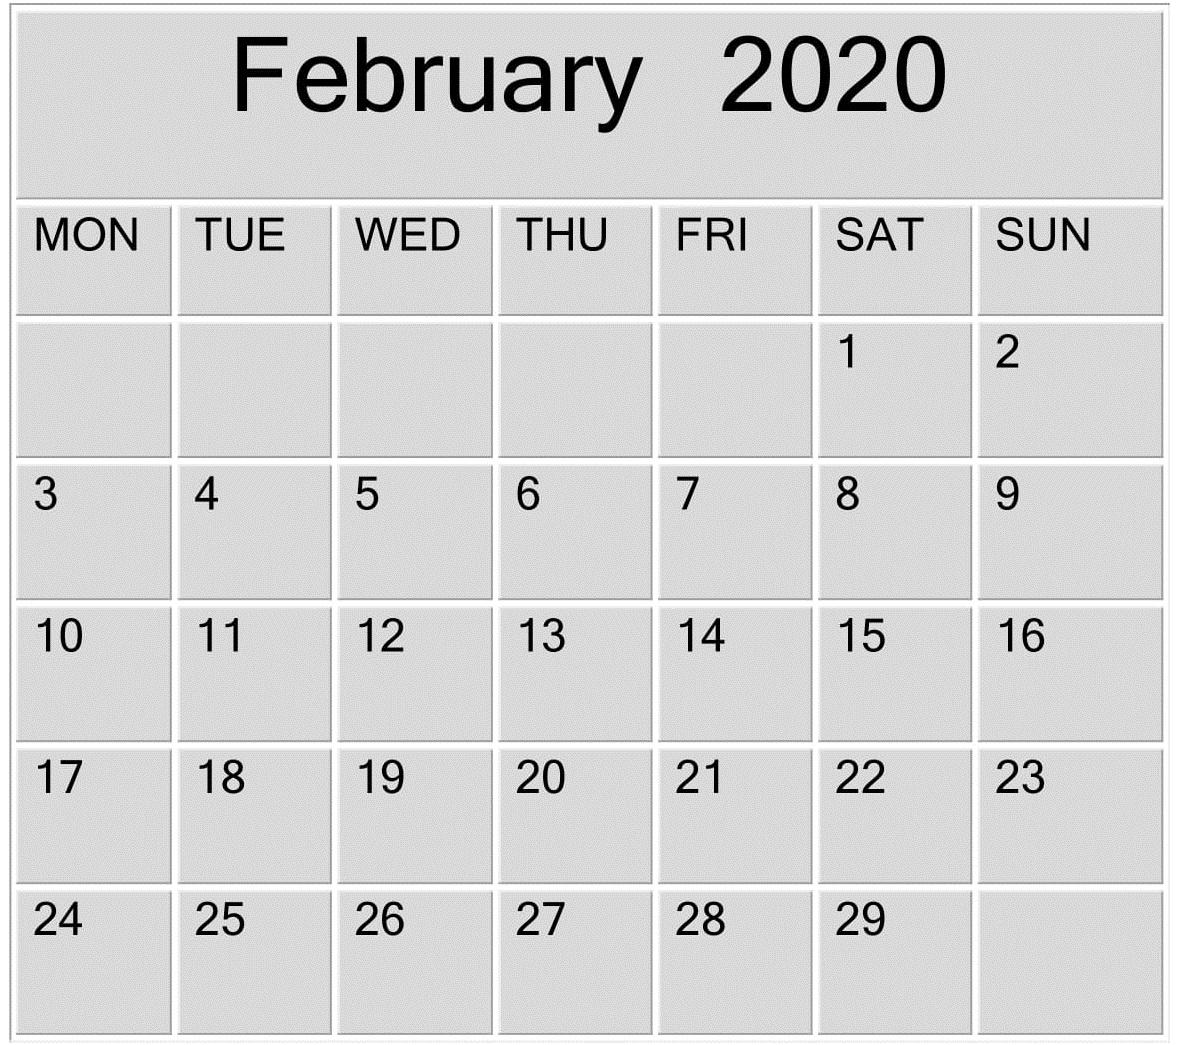 February 2020 Blank Calendar Word, Excel Template – Free